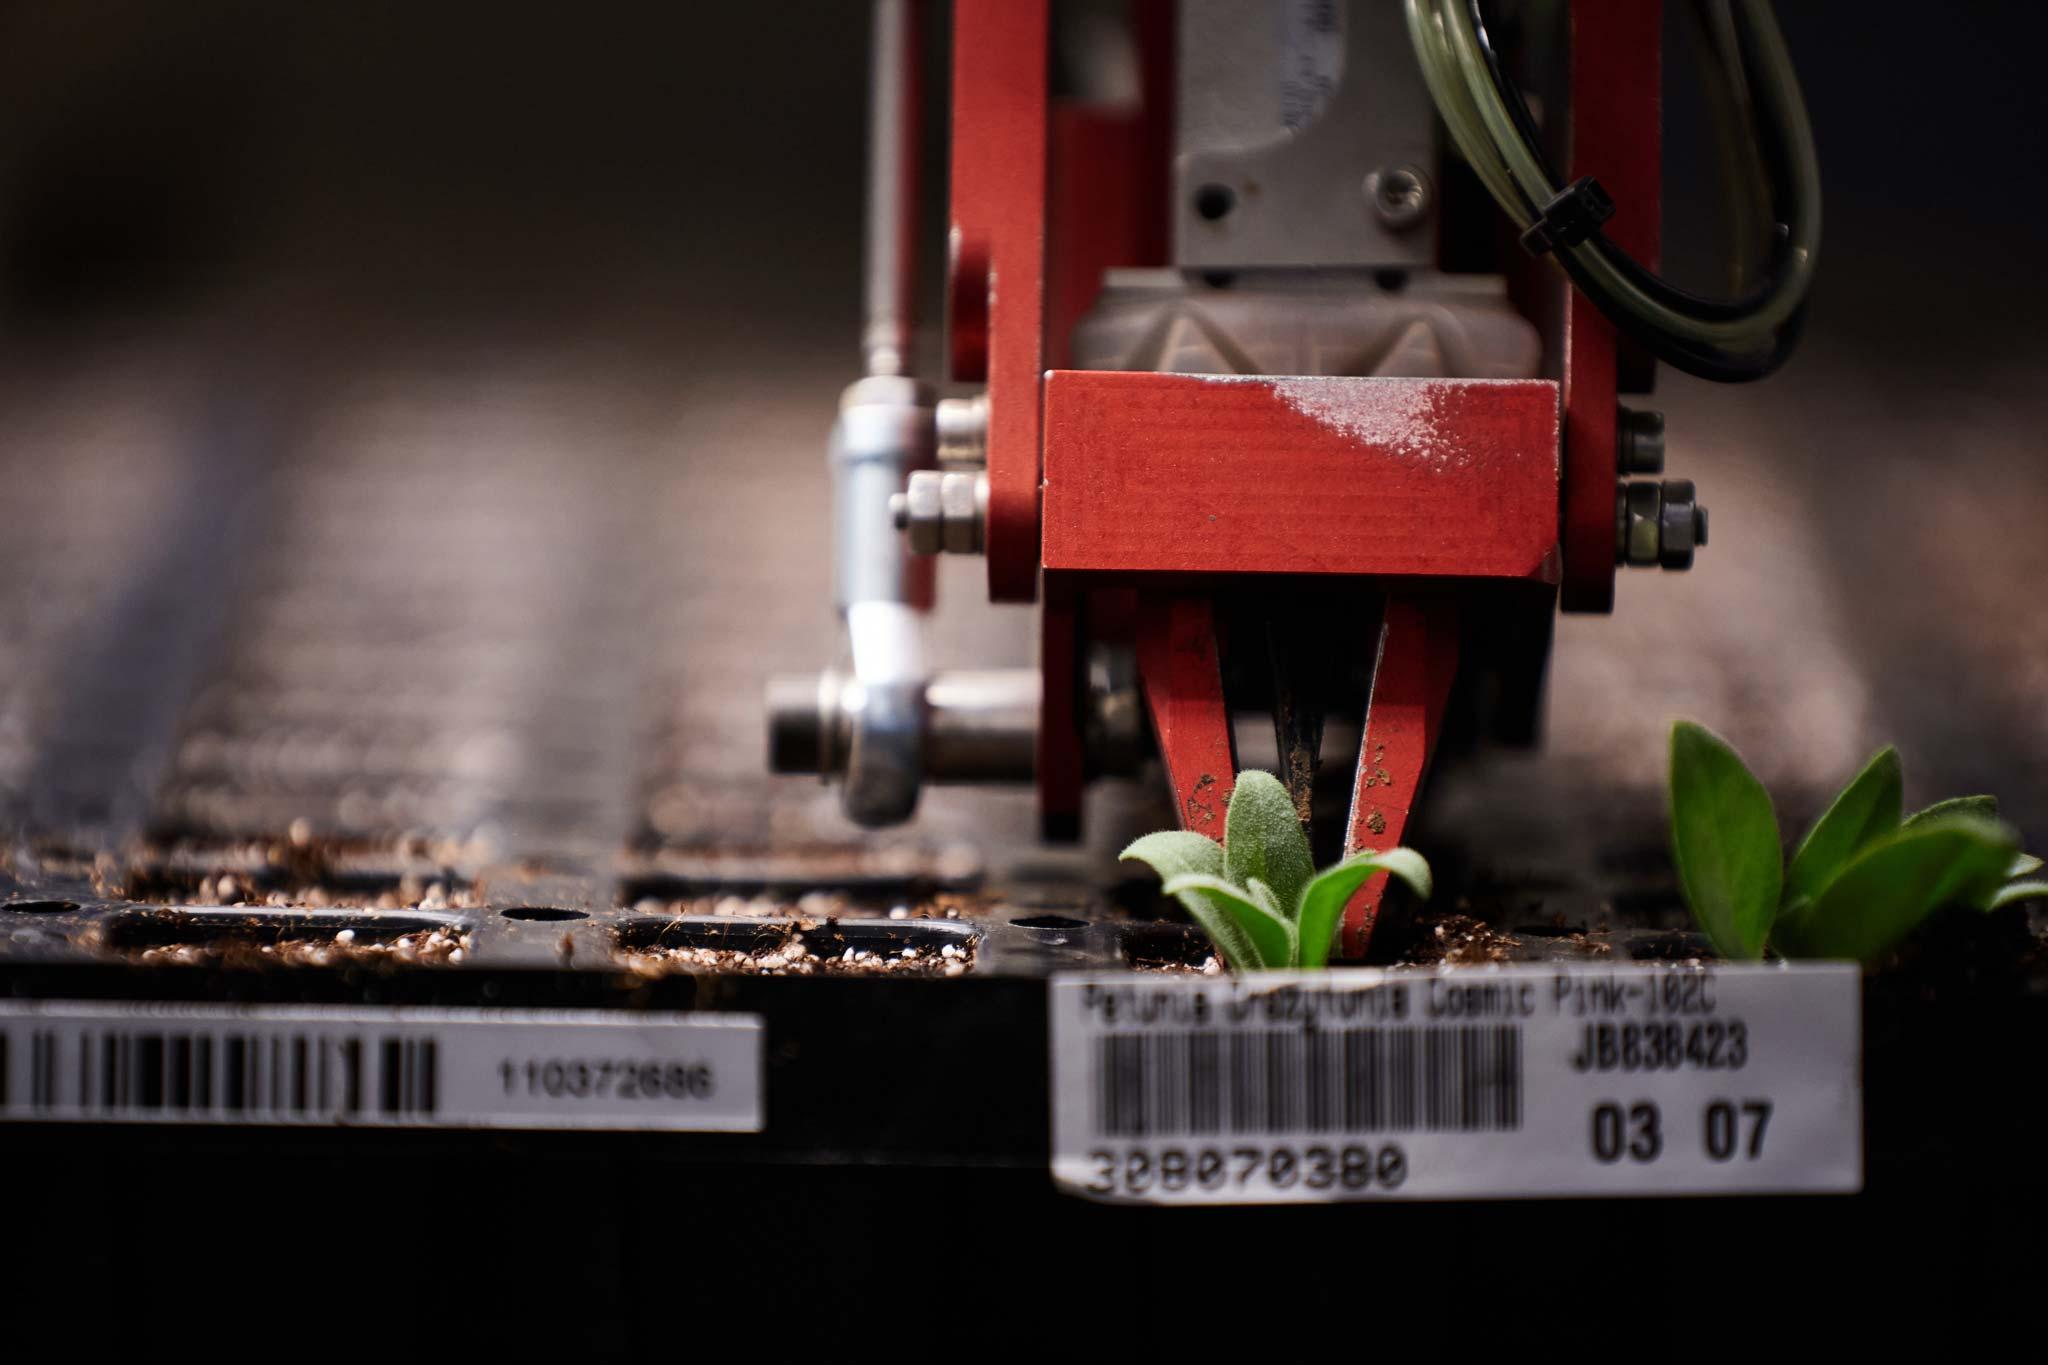 flexistart-automated growing -jiffygroup